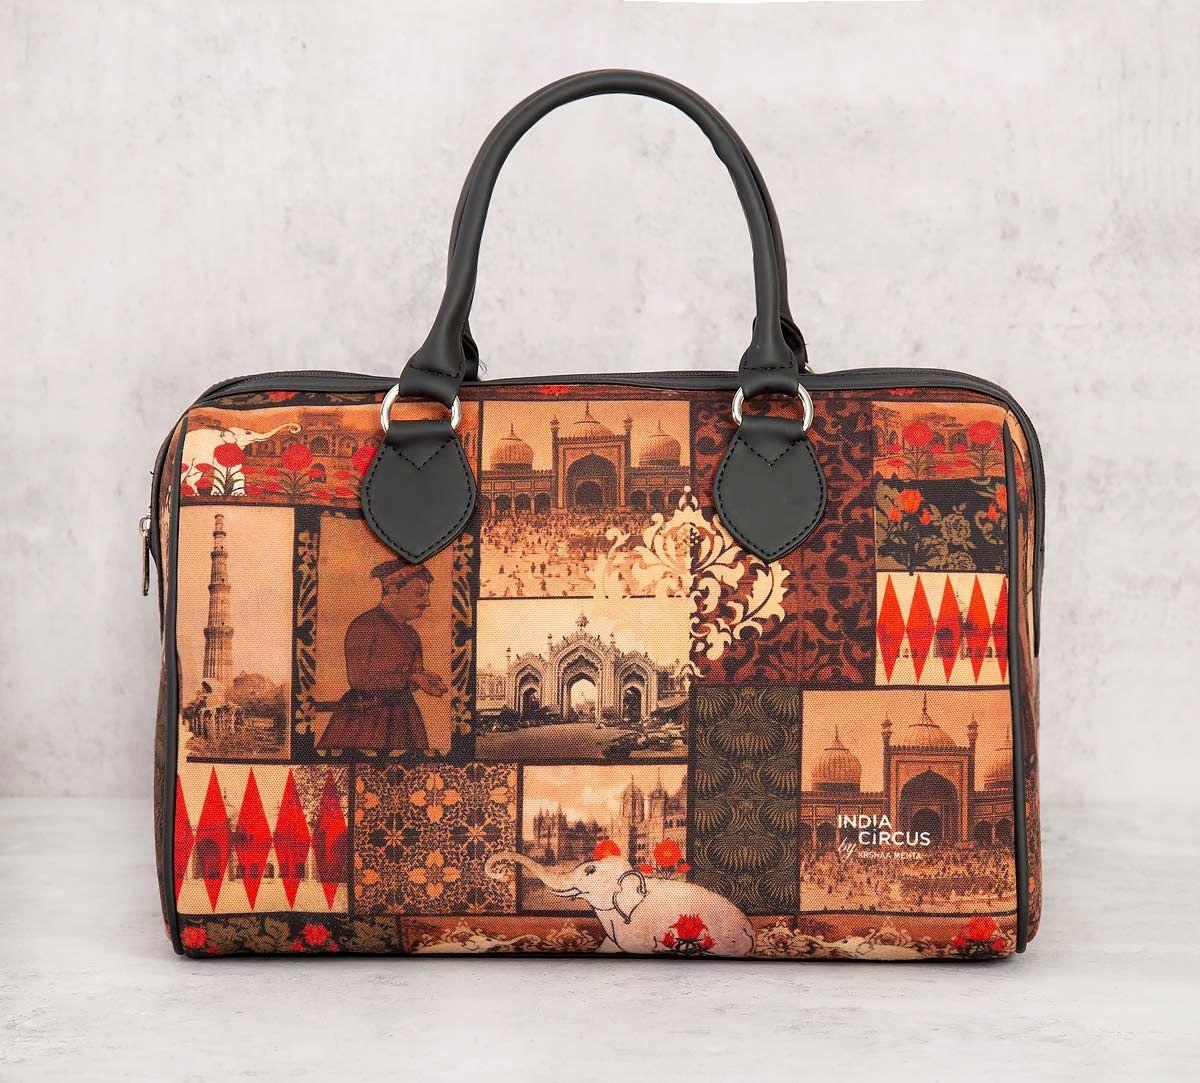 India Circus The Mughal Era Duffle Bag